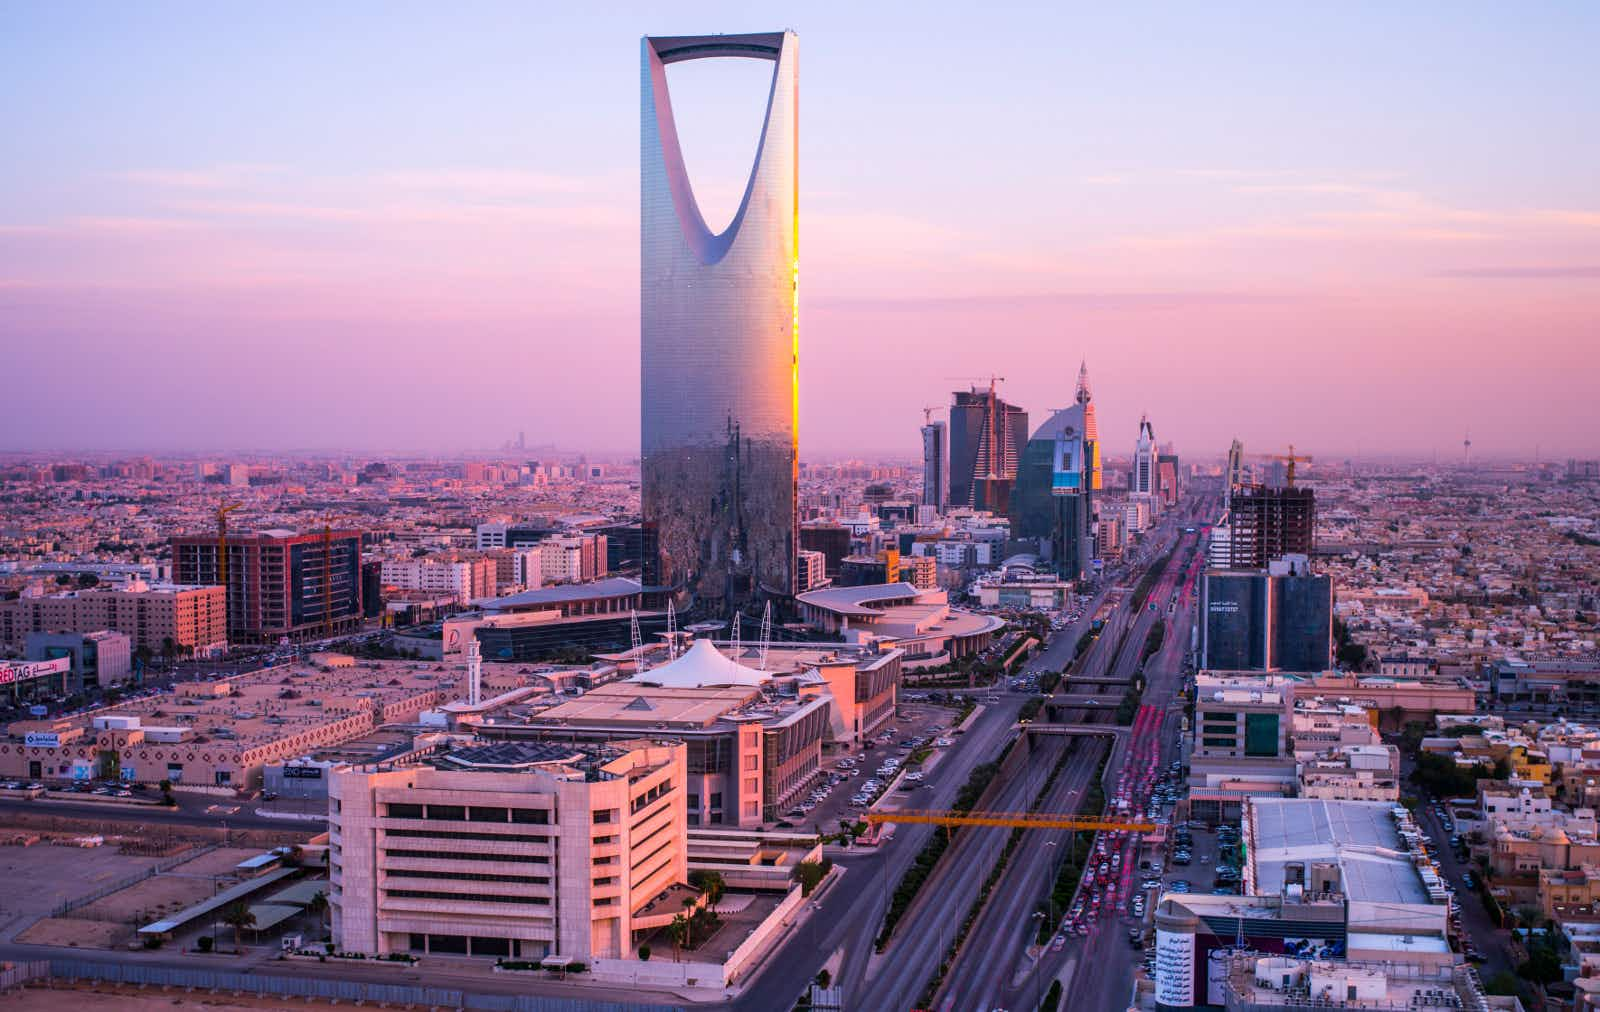 Eating your way through Riyadh: a culinary guide